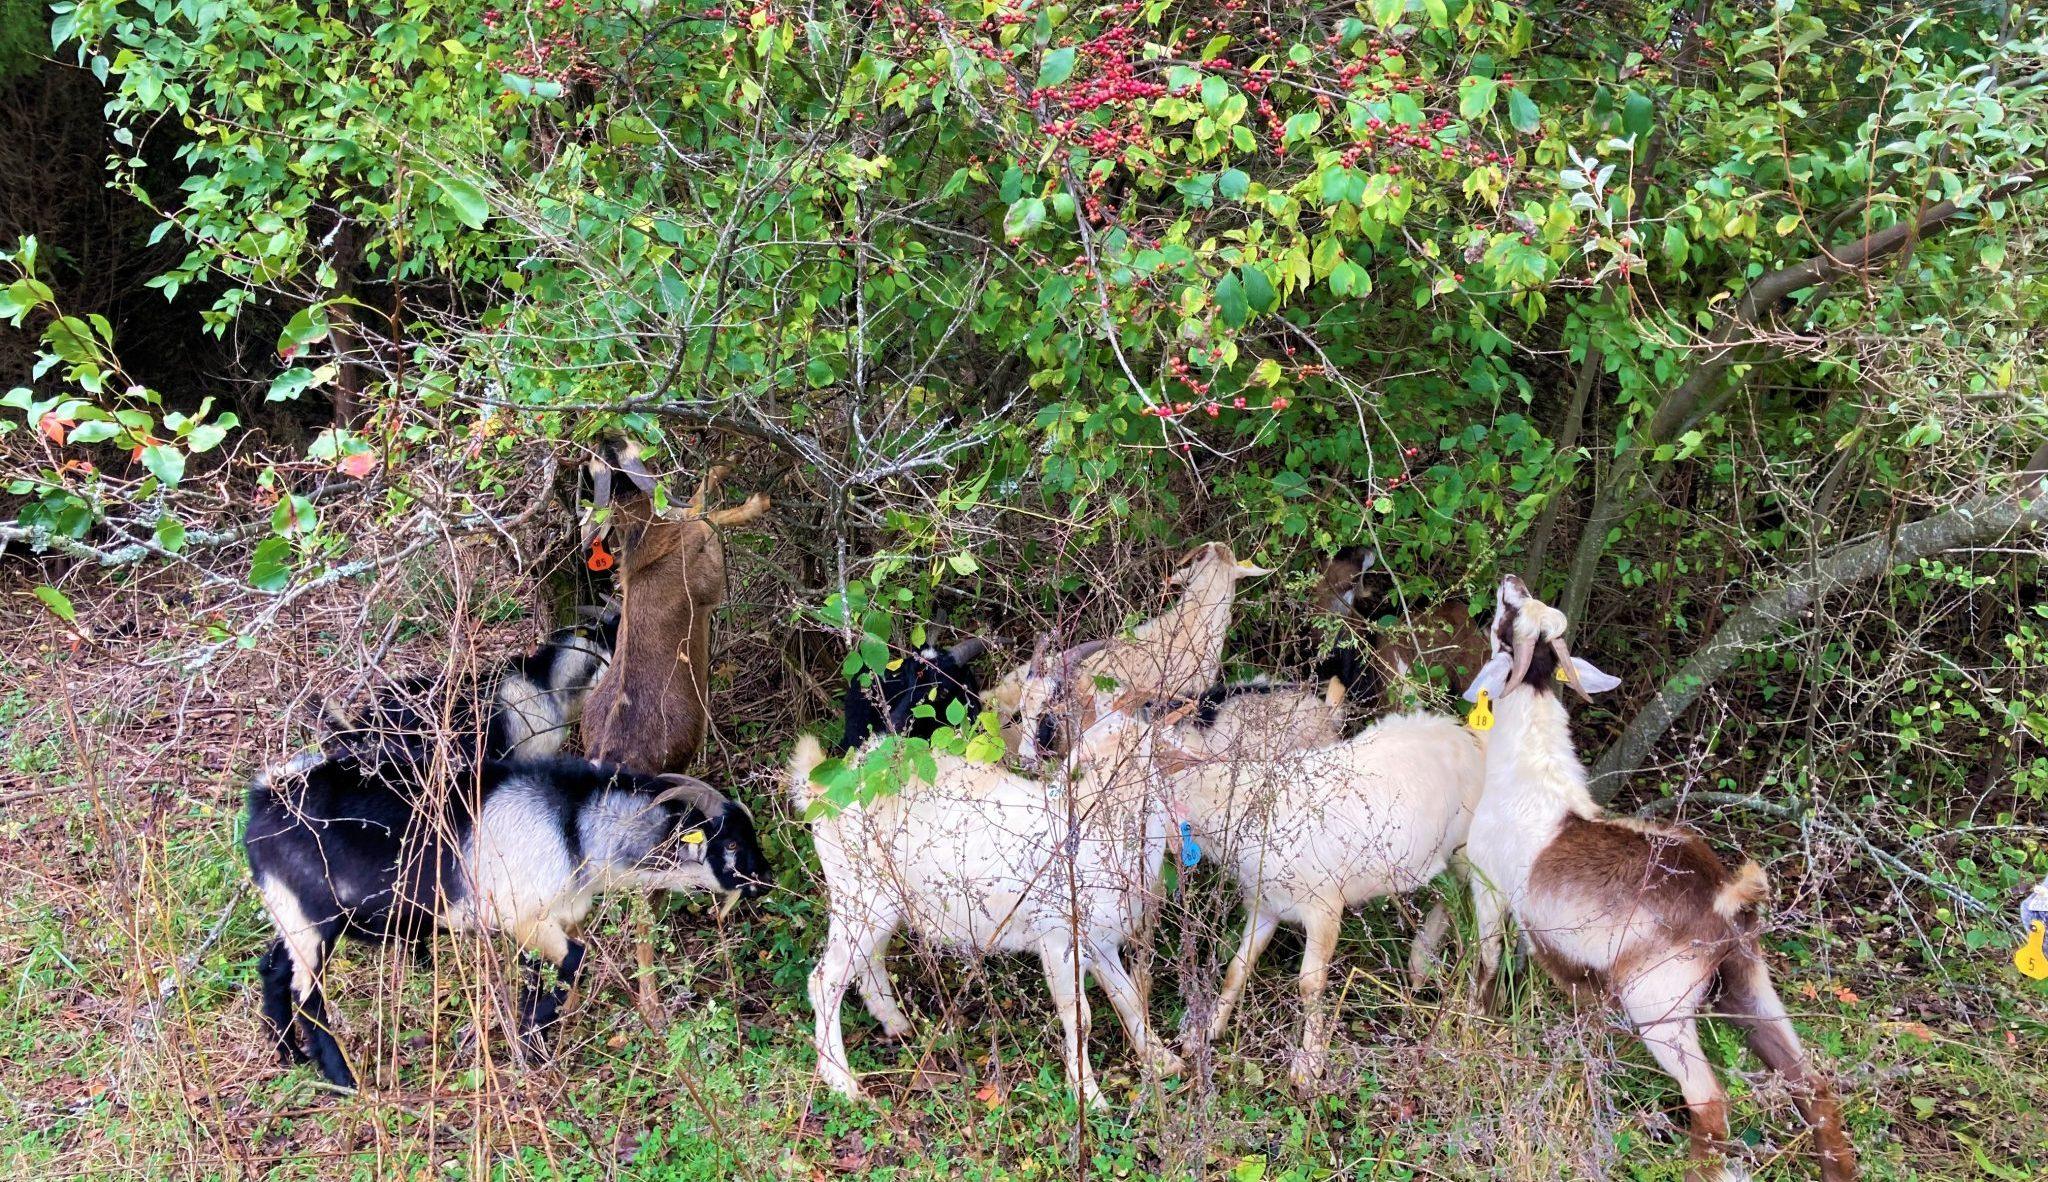 Goats Browsing